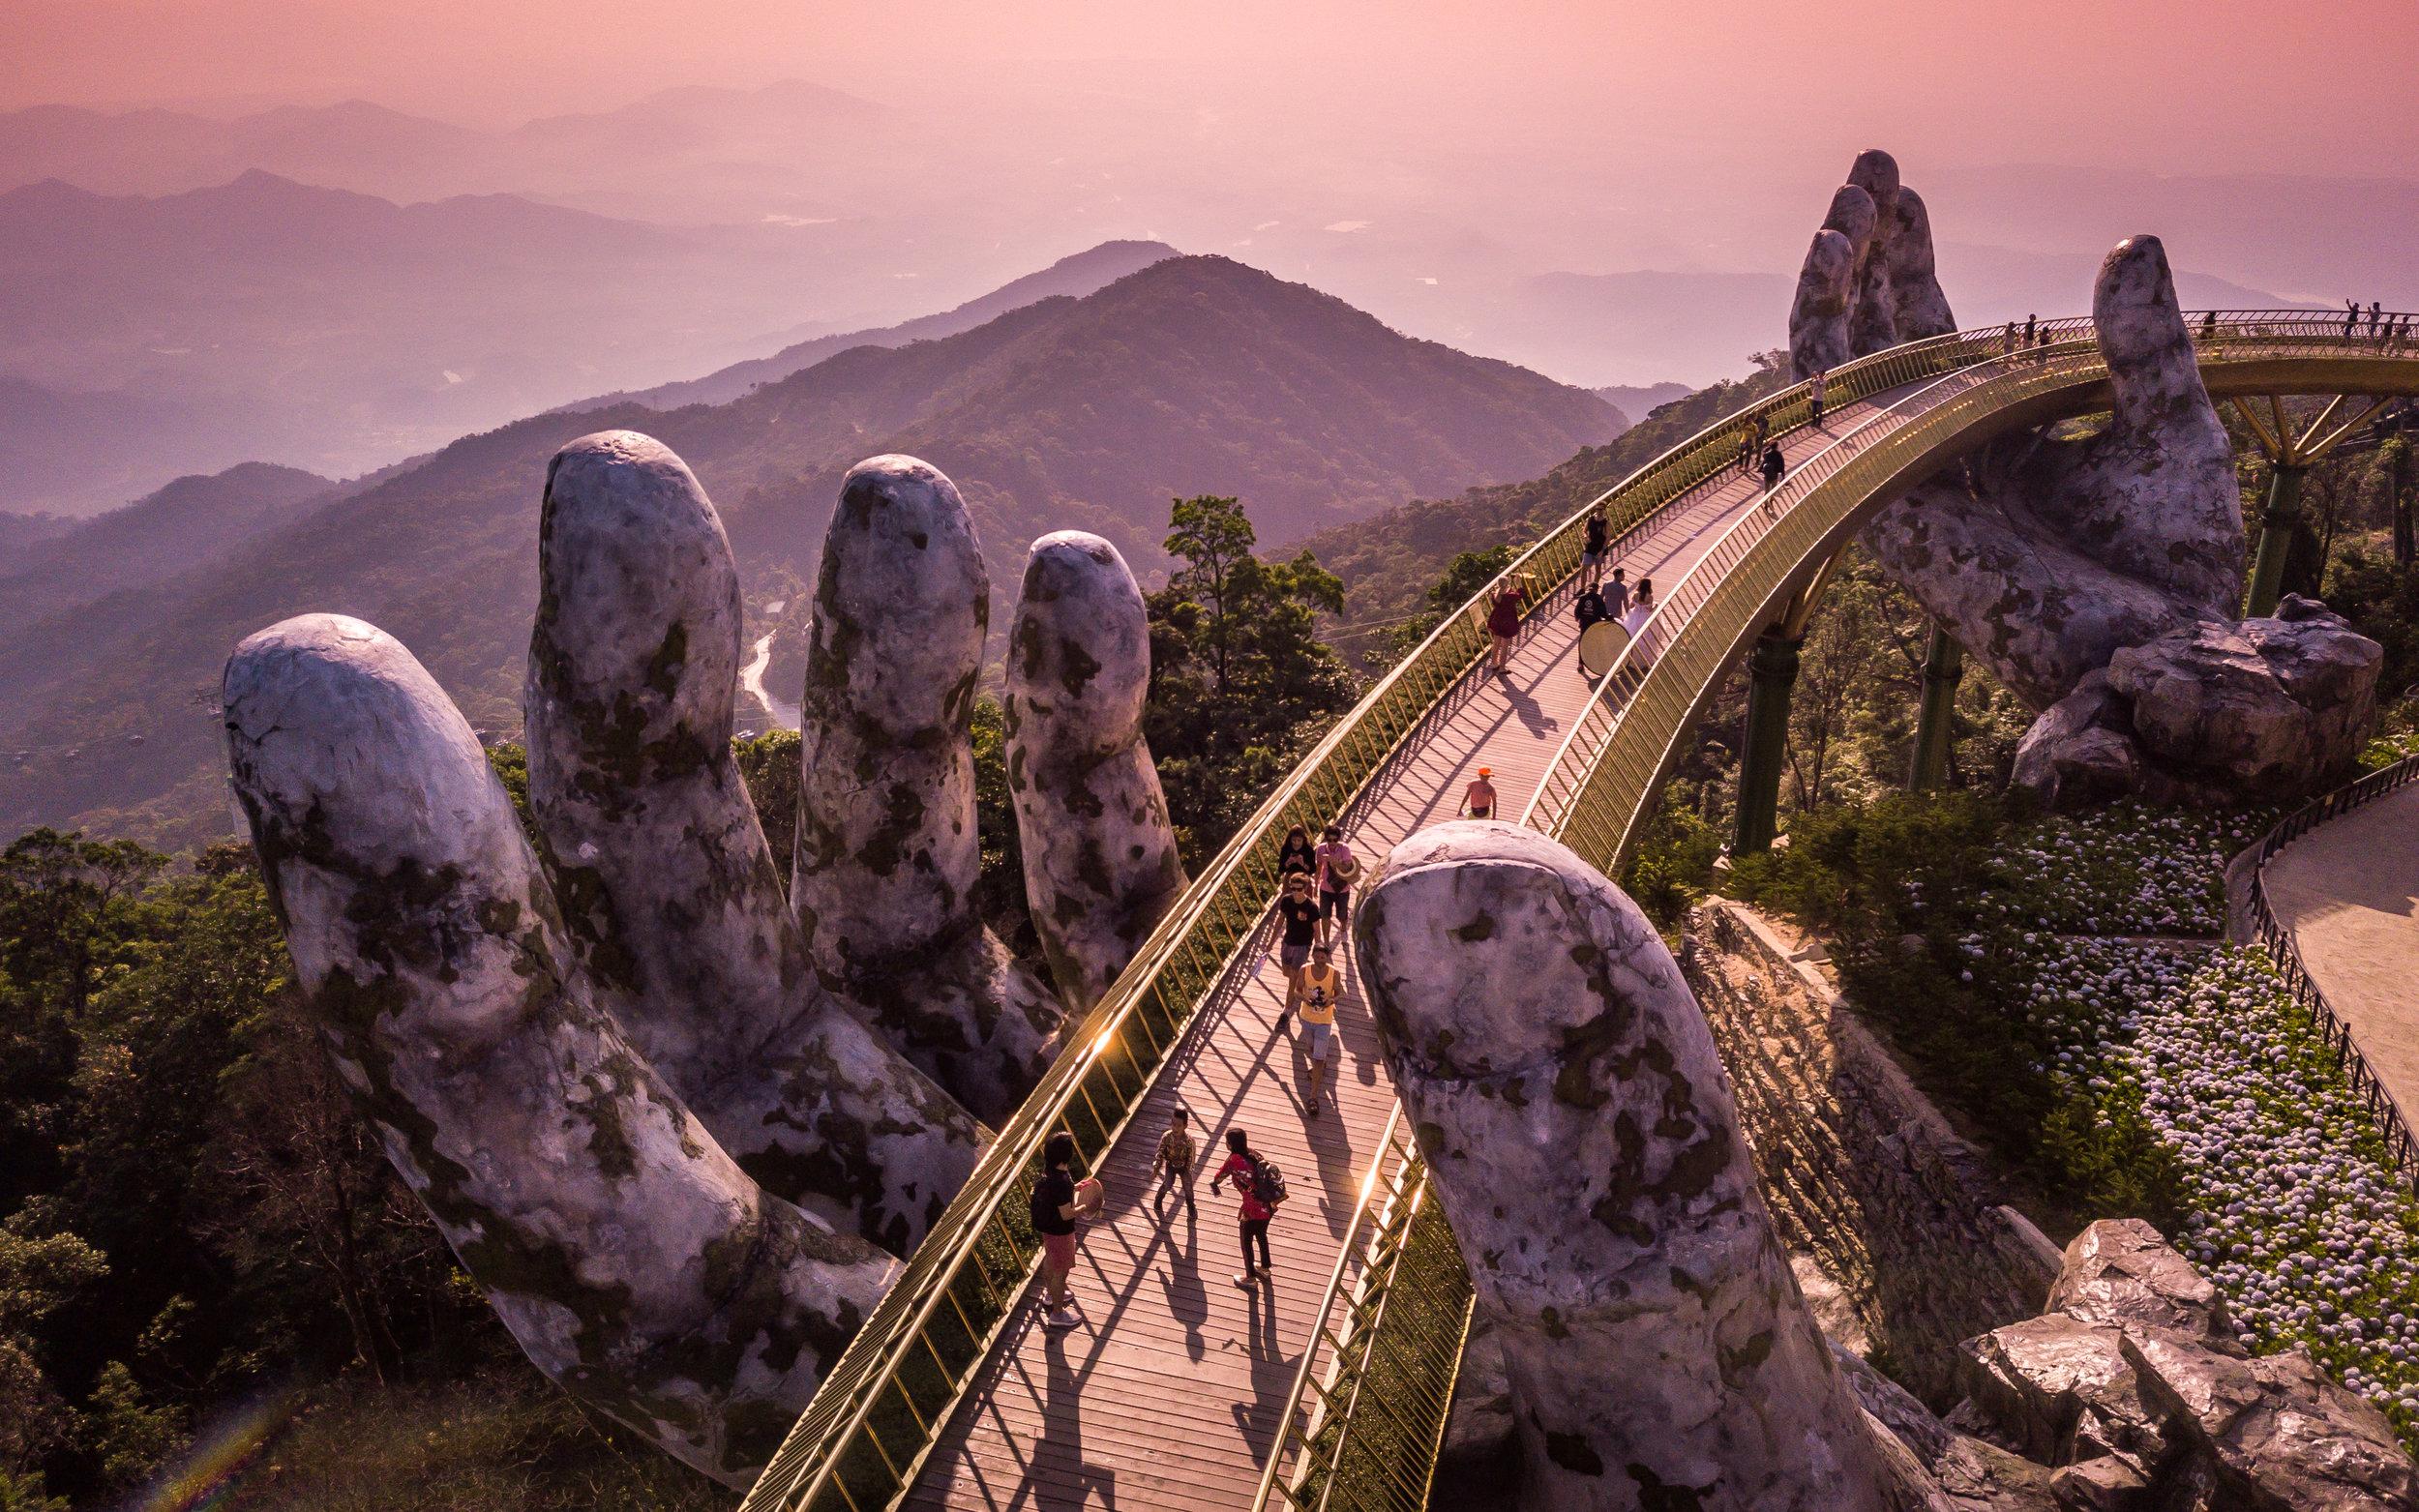 Golden Bridge - Bà Nà Hills, Da Nang, Vietnam